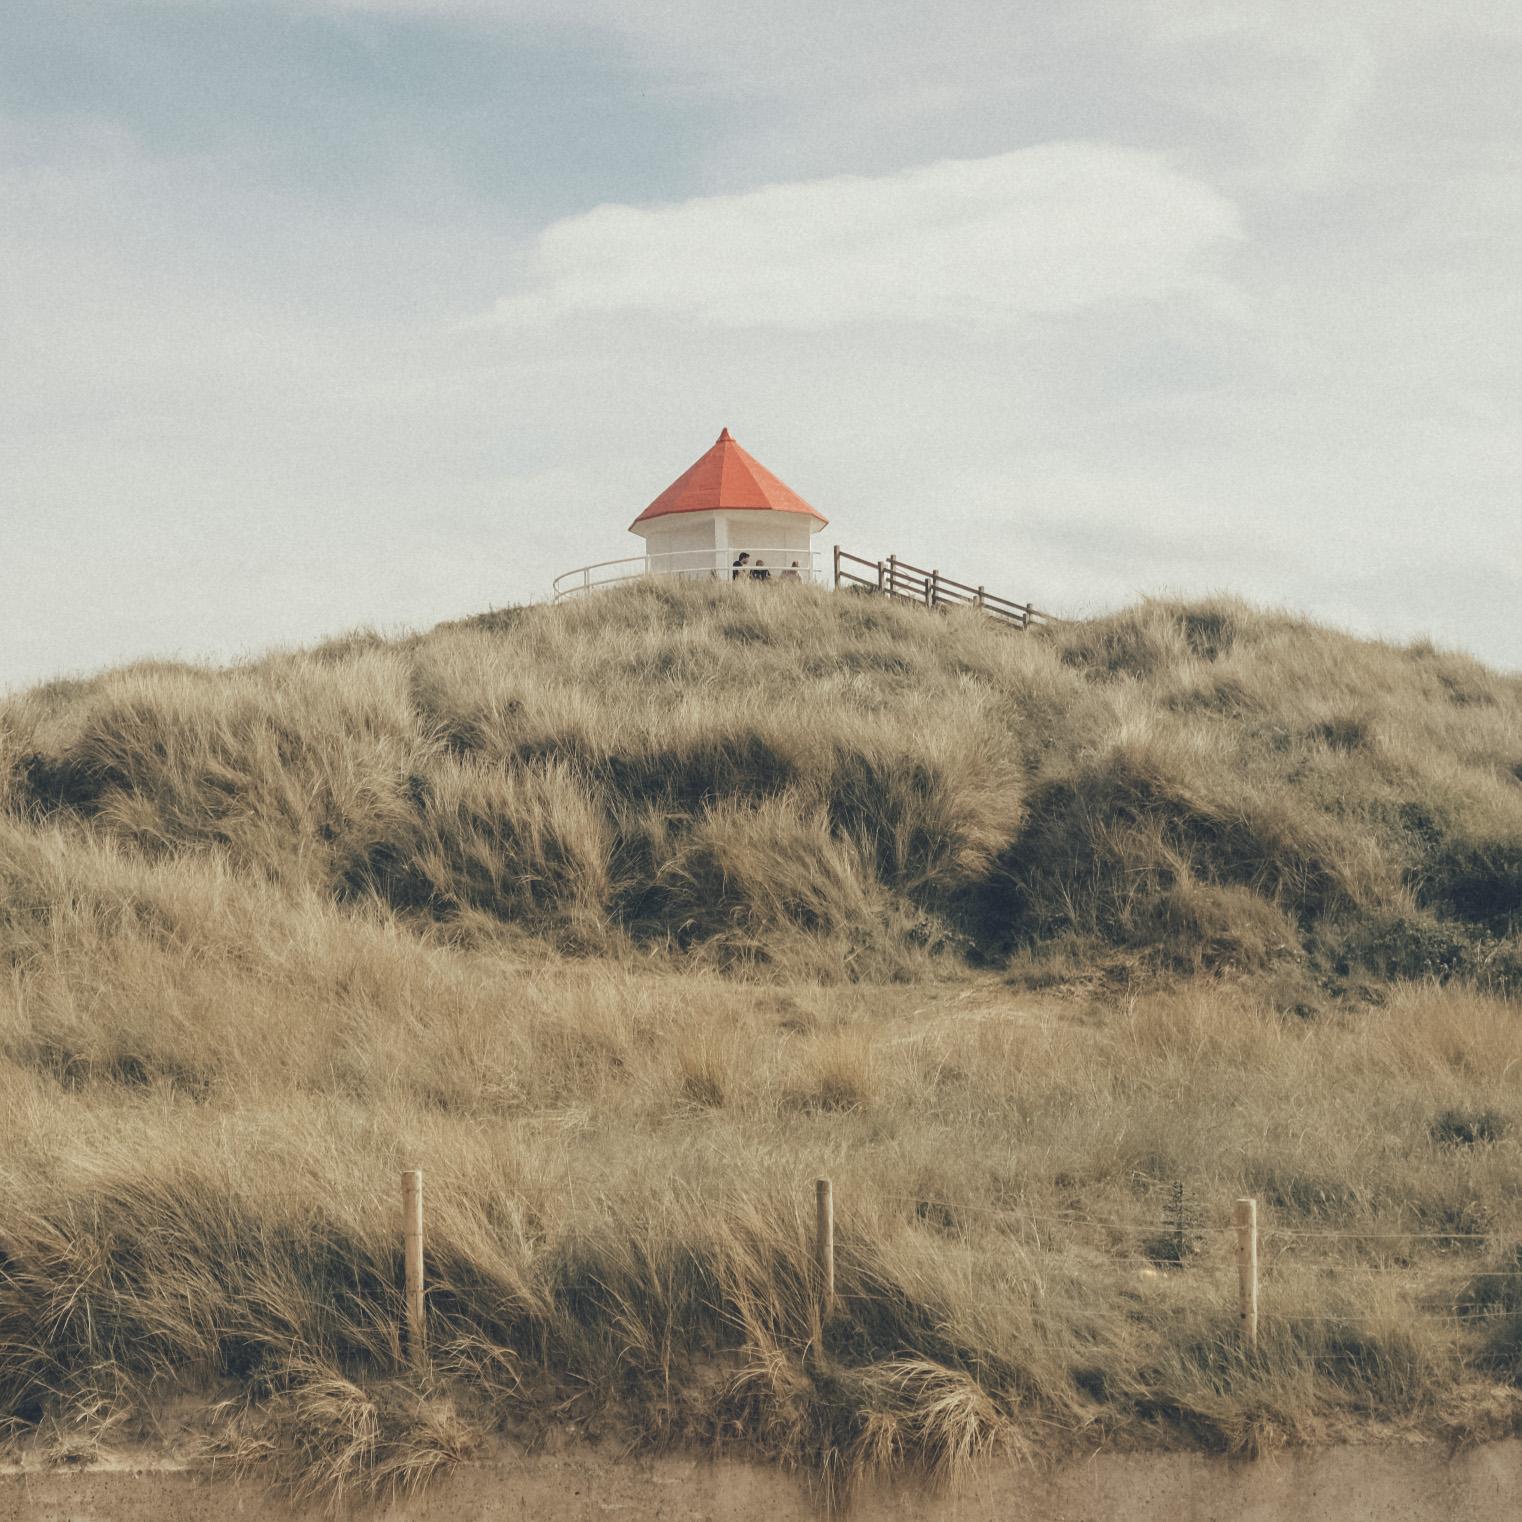 Wenduine DeHaan NorthSea Travel Blogger Tips12.jpg